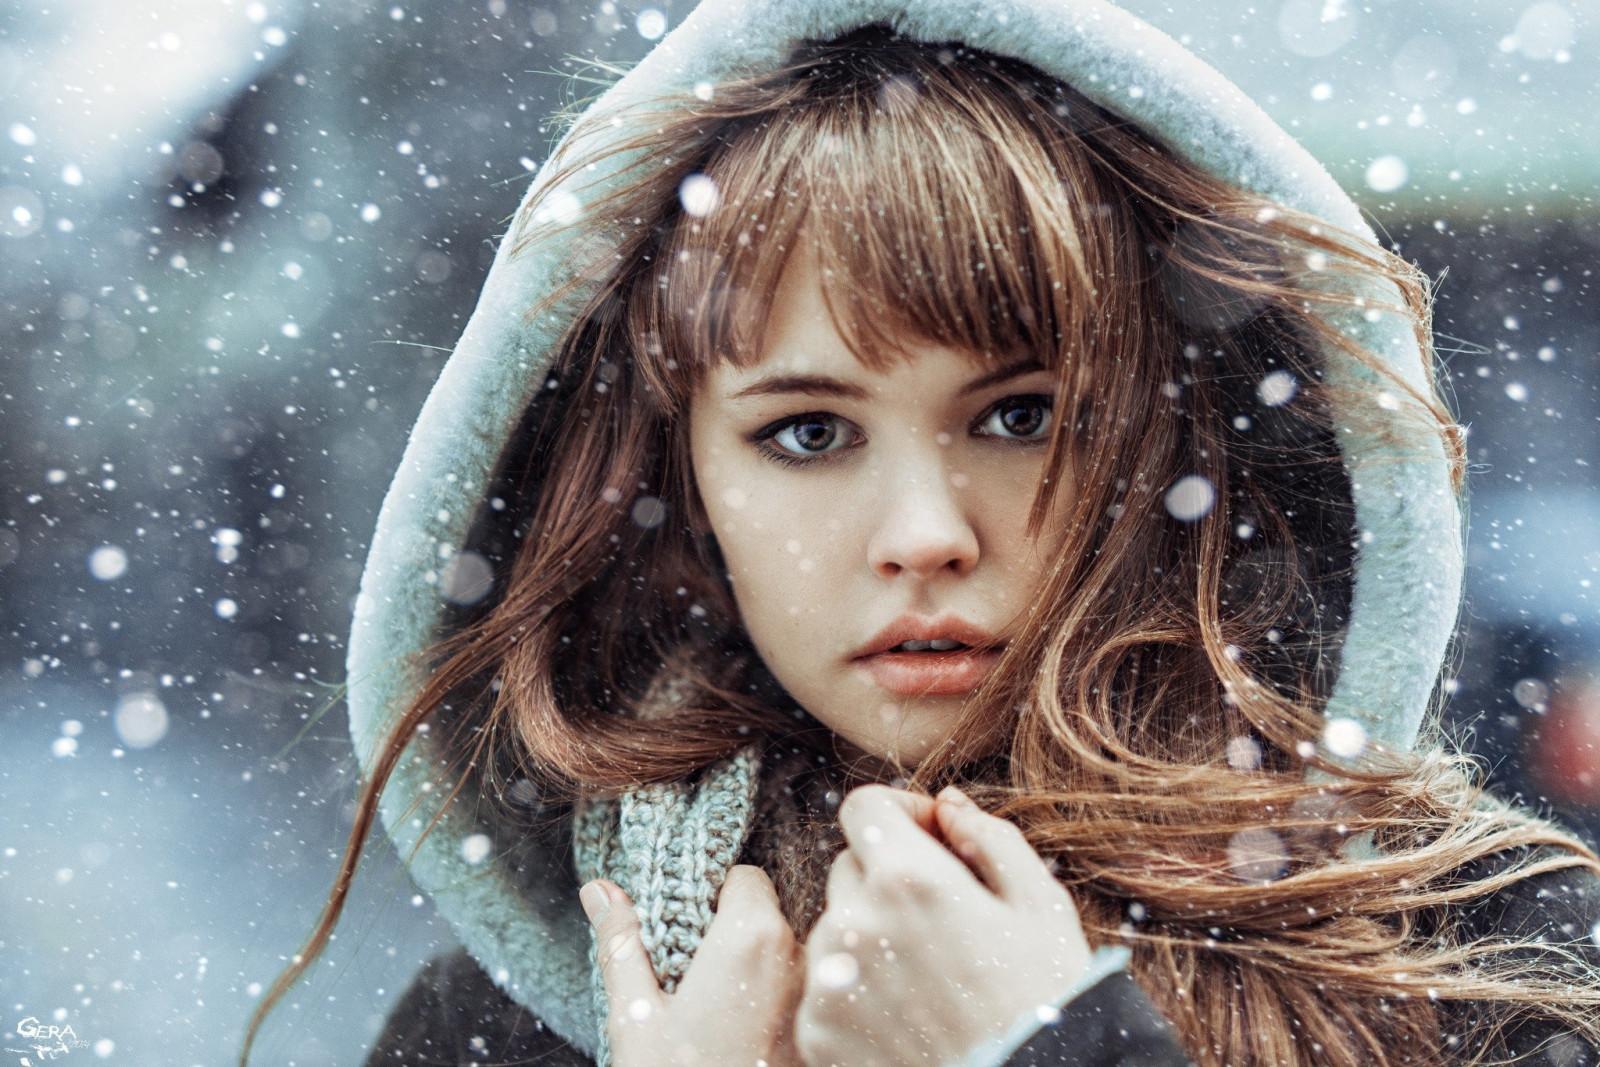 model, Anastasia Scheglova, girl, beauty, eye, computer wallpaper, portrait photography, photo shoot, fictional character, photomontage